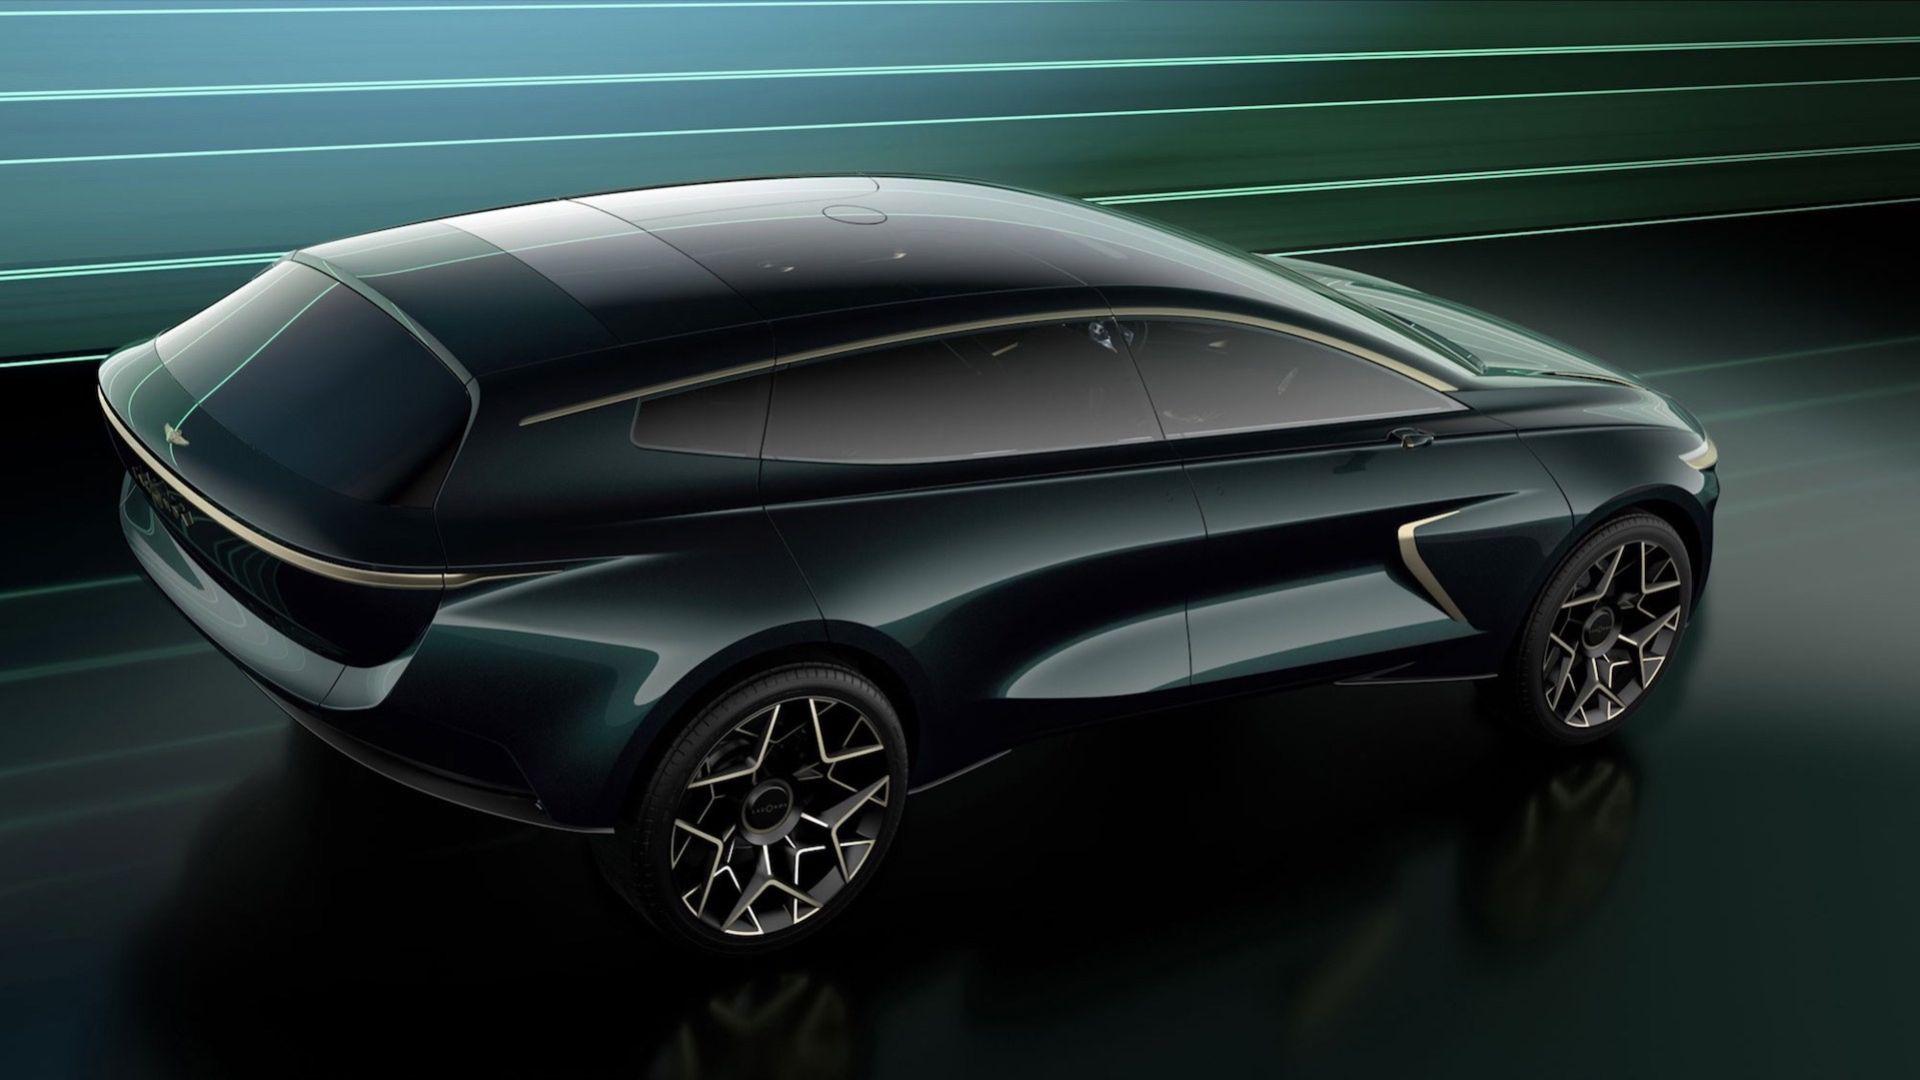 Det blir inga eldrivna Lagondor från Aston Martin